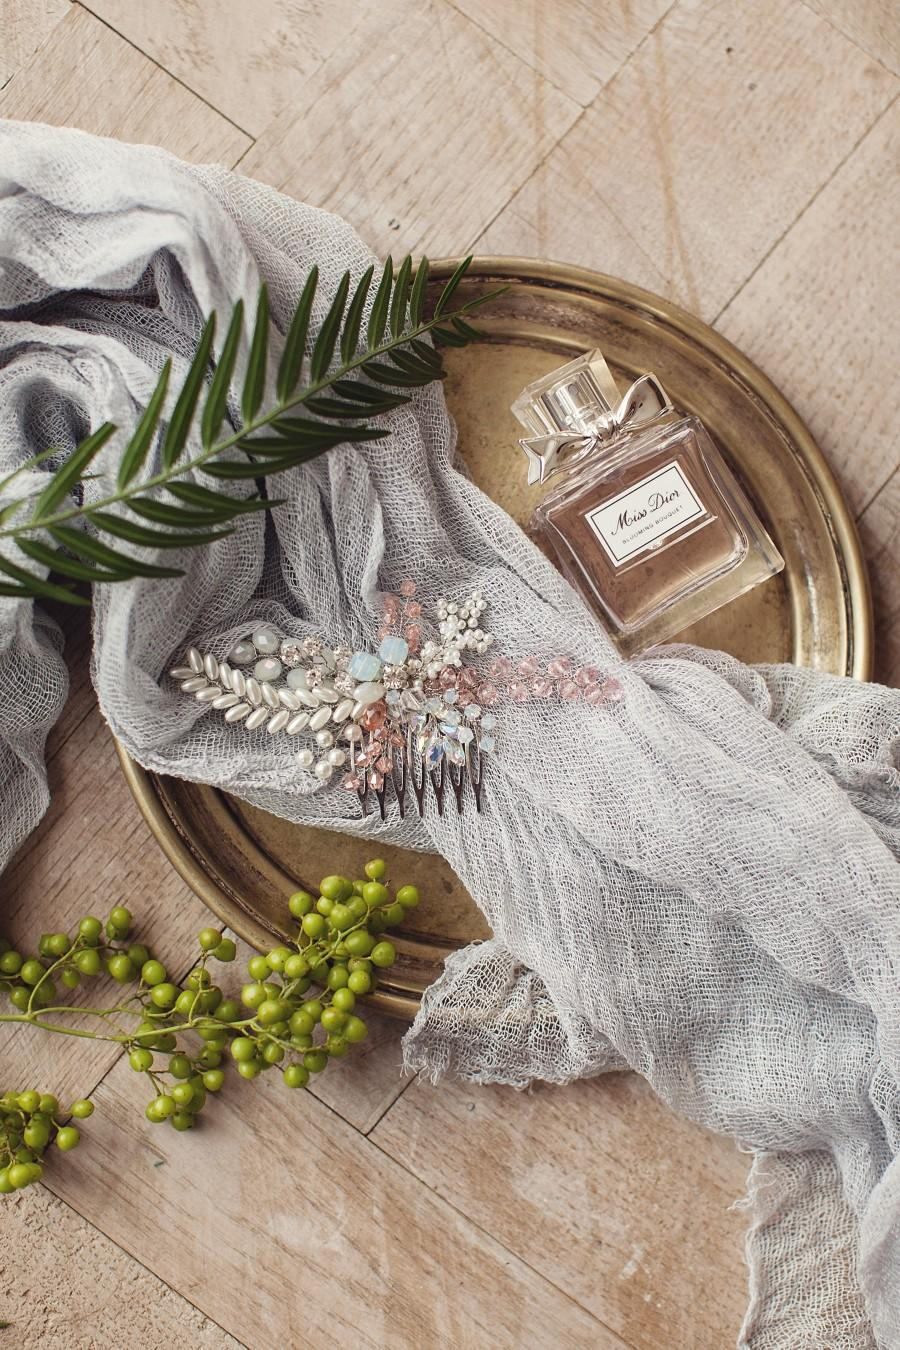 زفاف - Свадебный гребень для волос